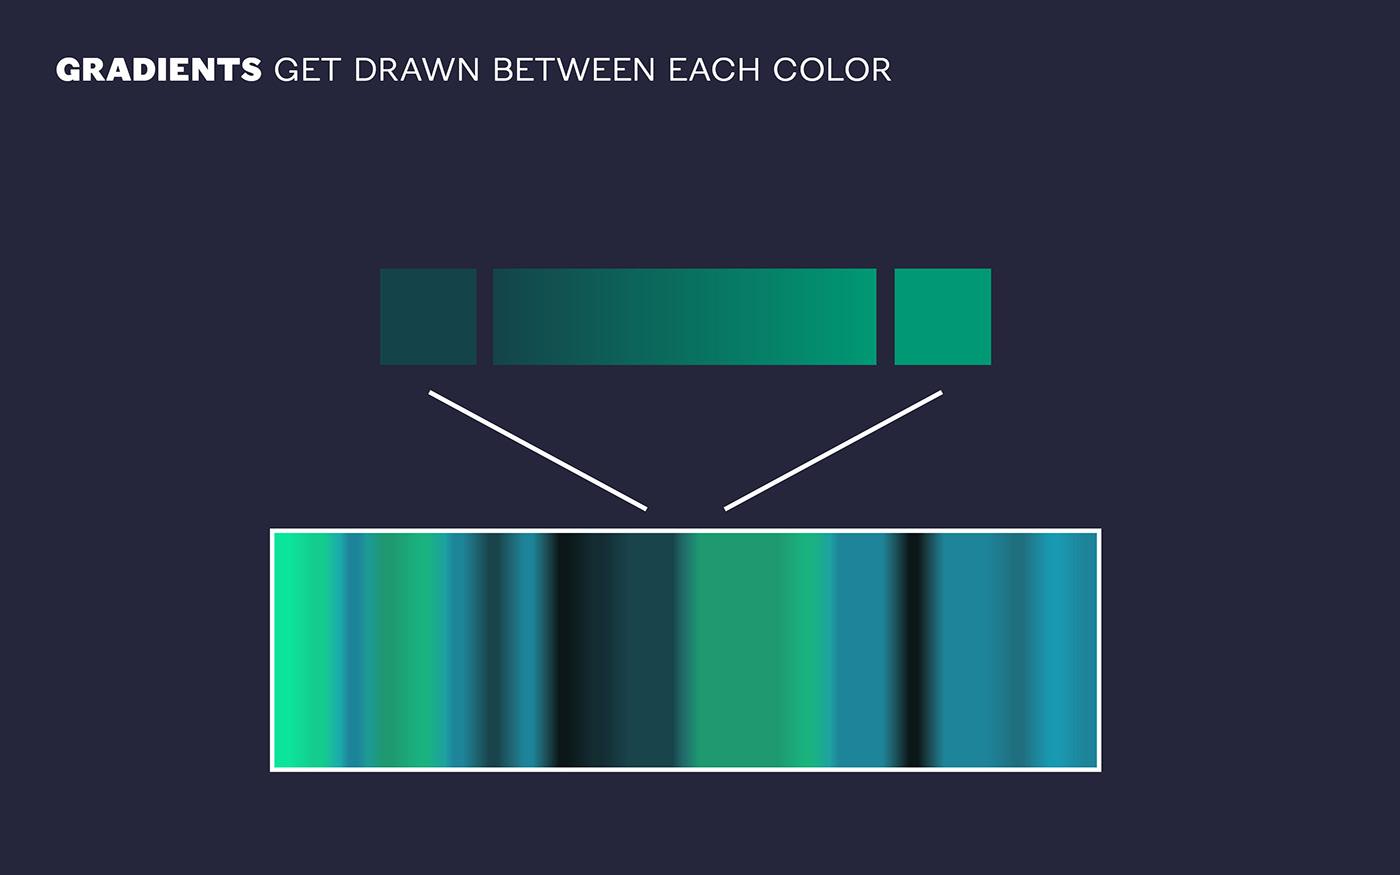 dataviz data visualization selftracking Quantified Self